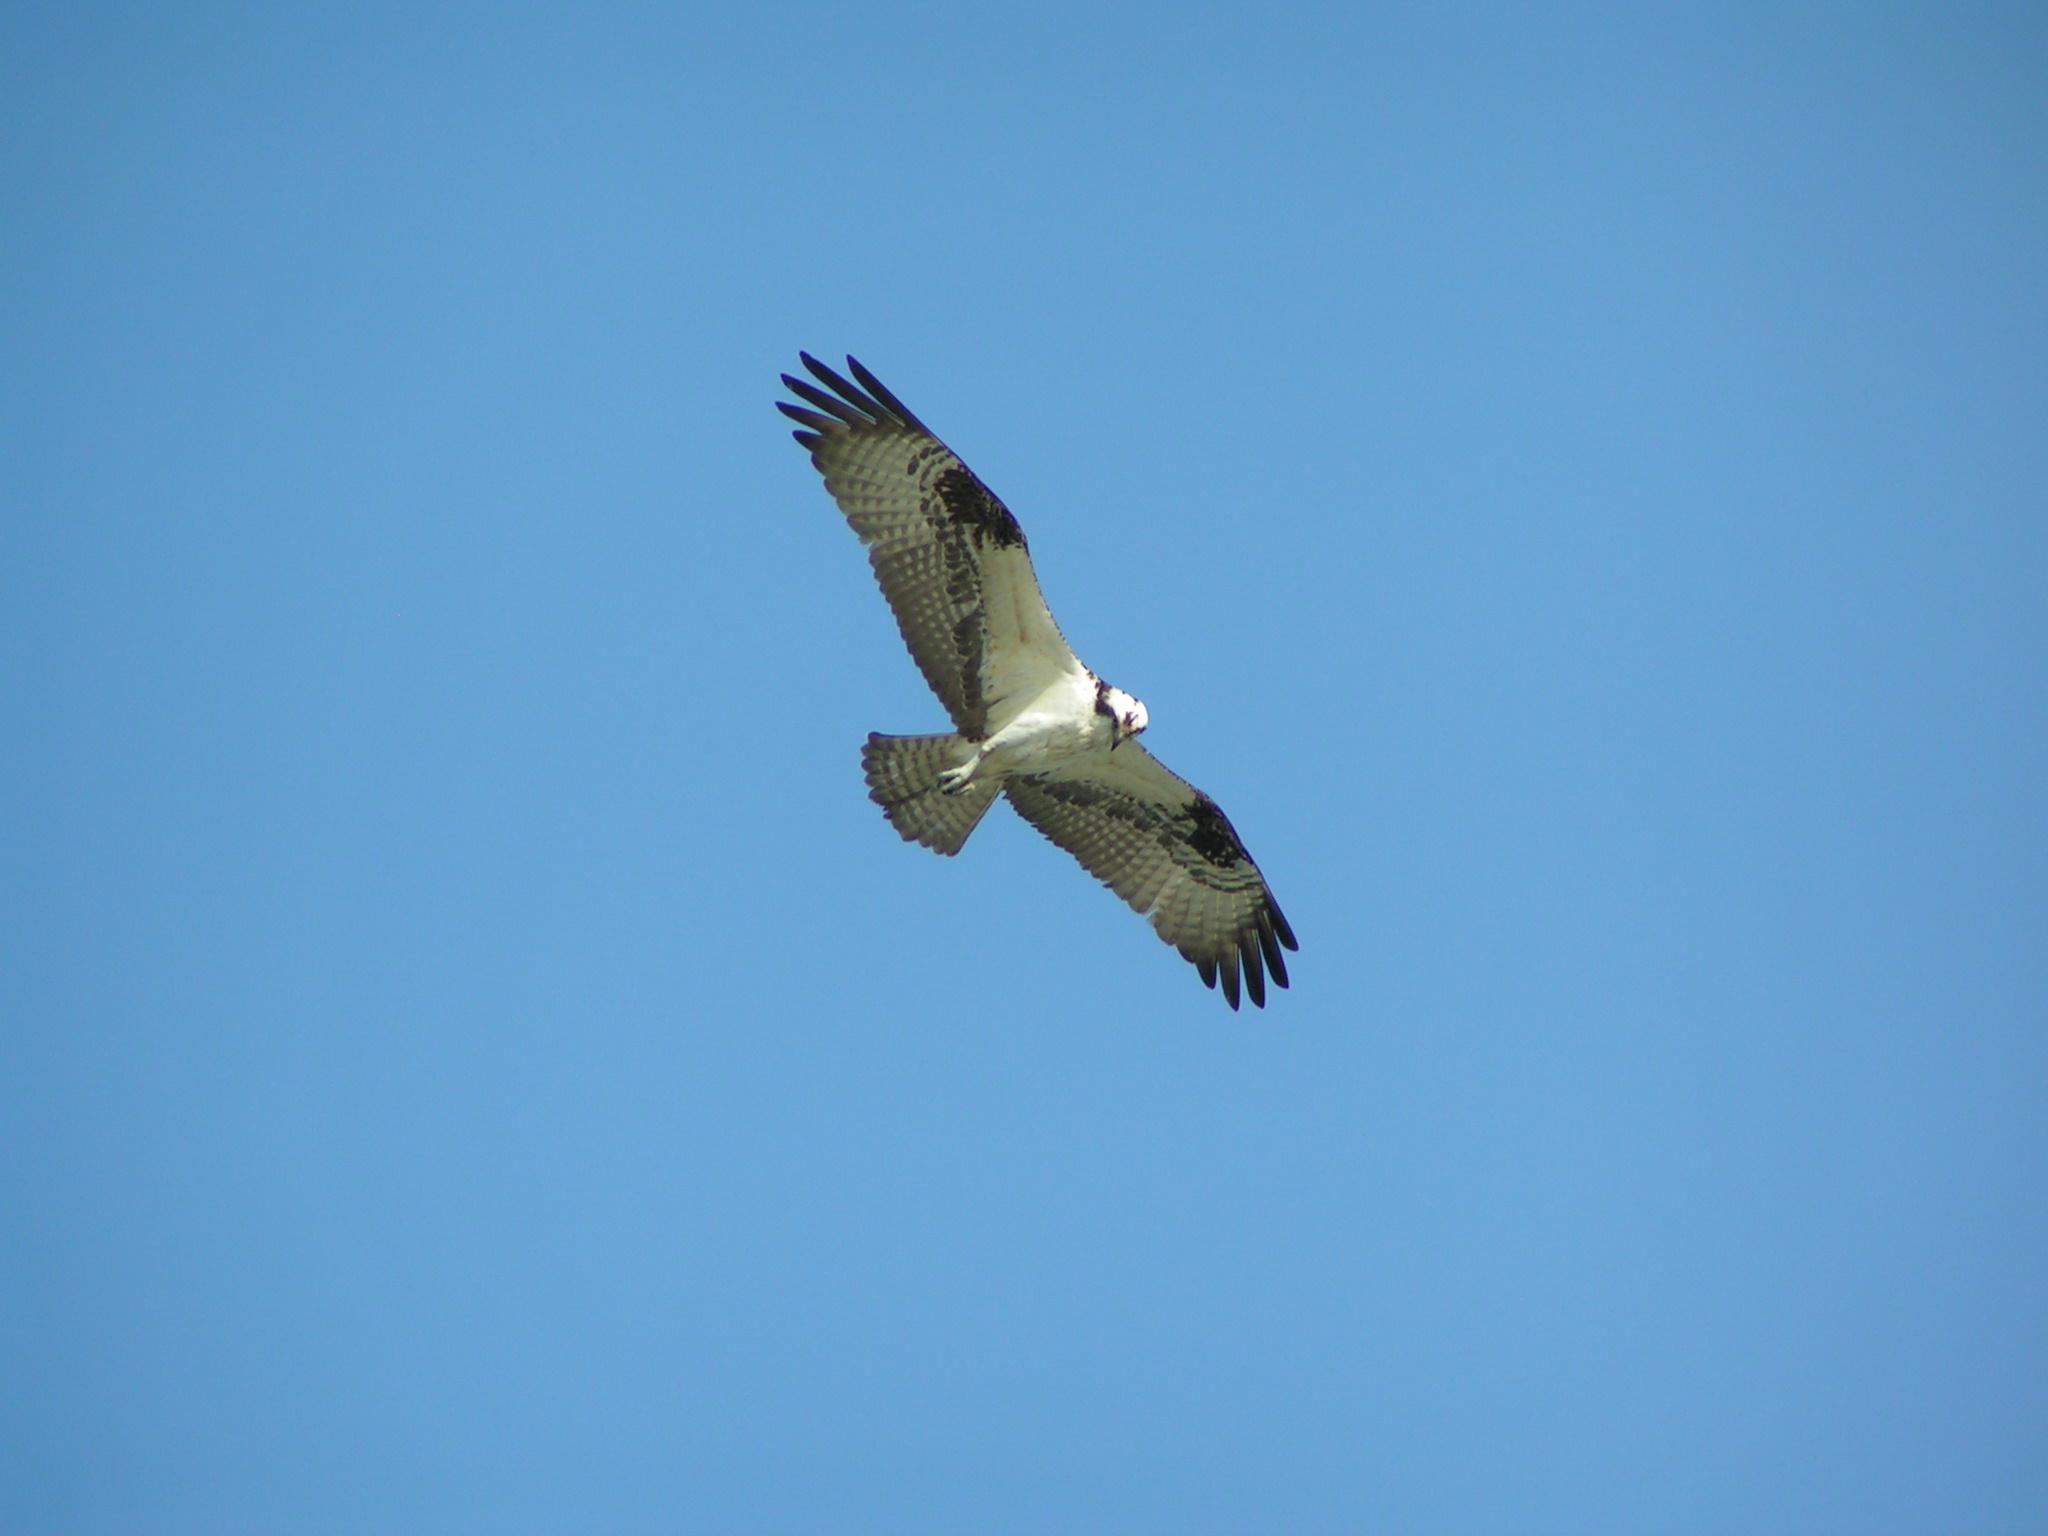 Osprey, raptors, birds of prey, hunting birds, DNREC